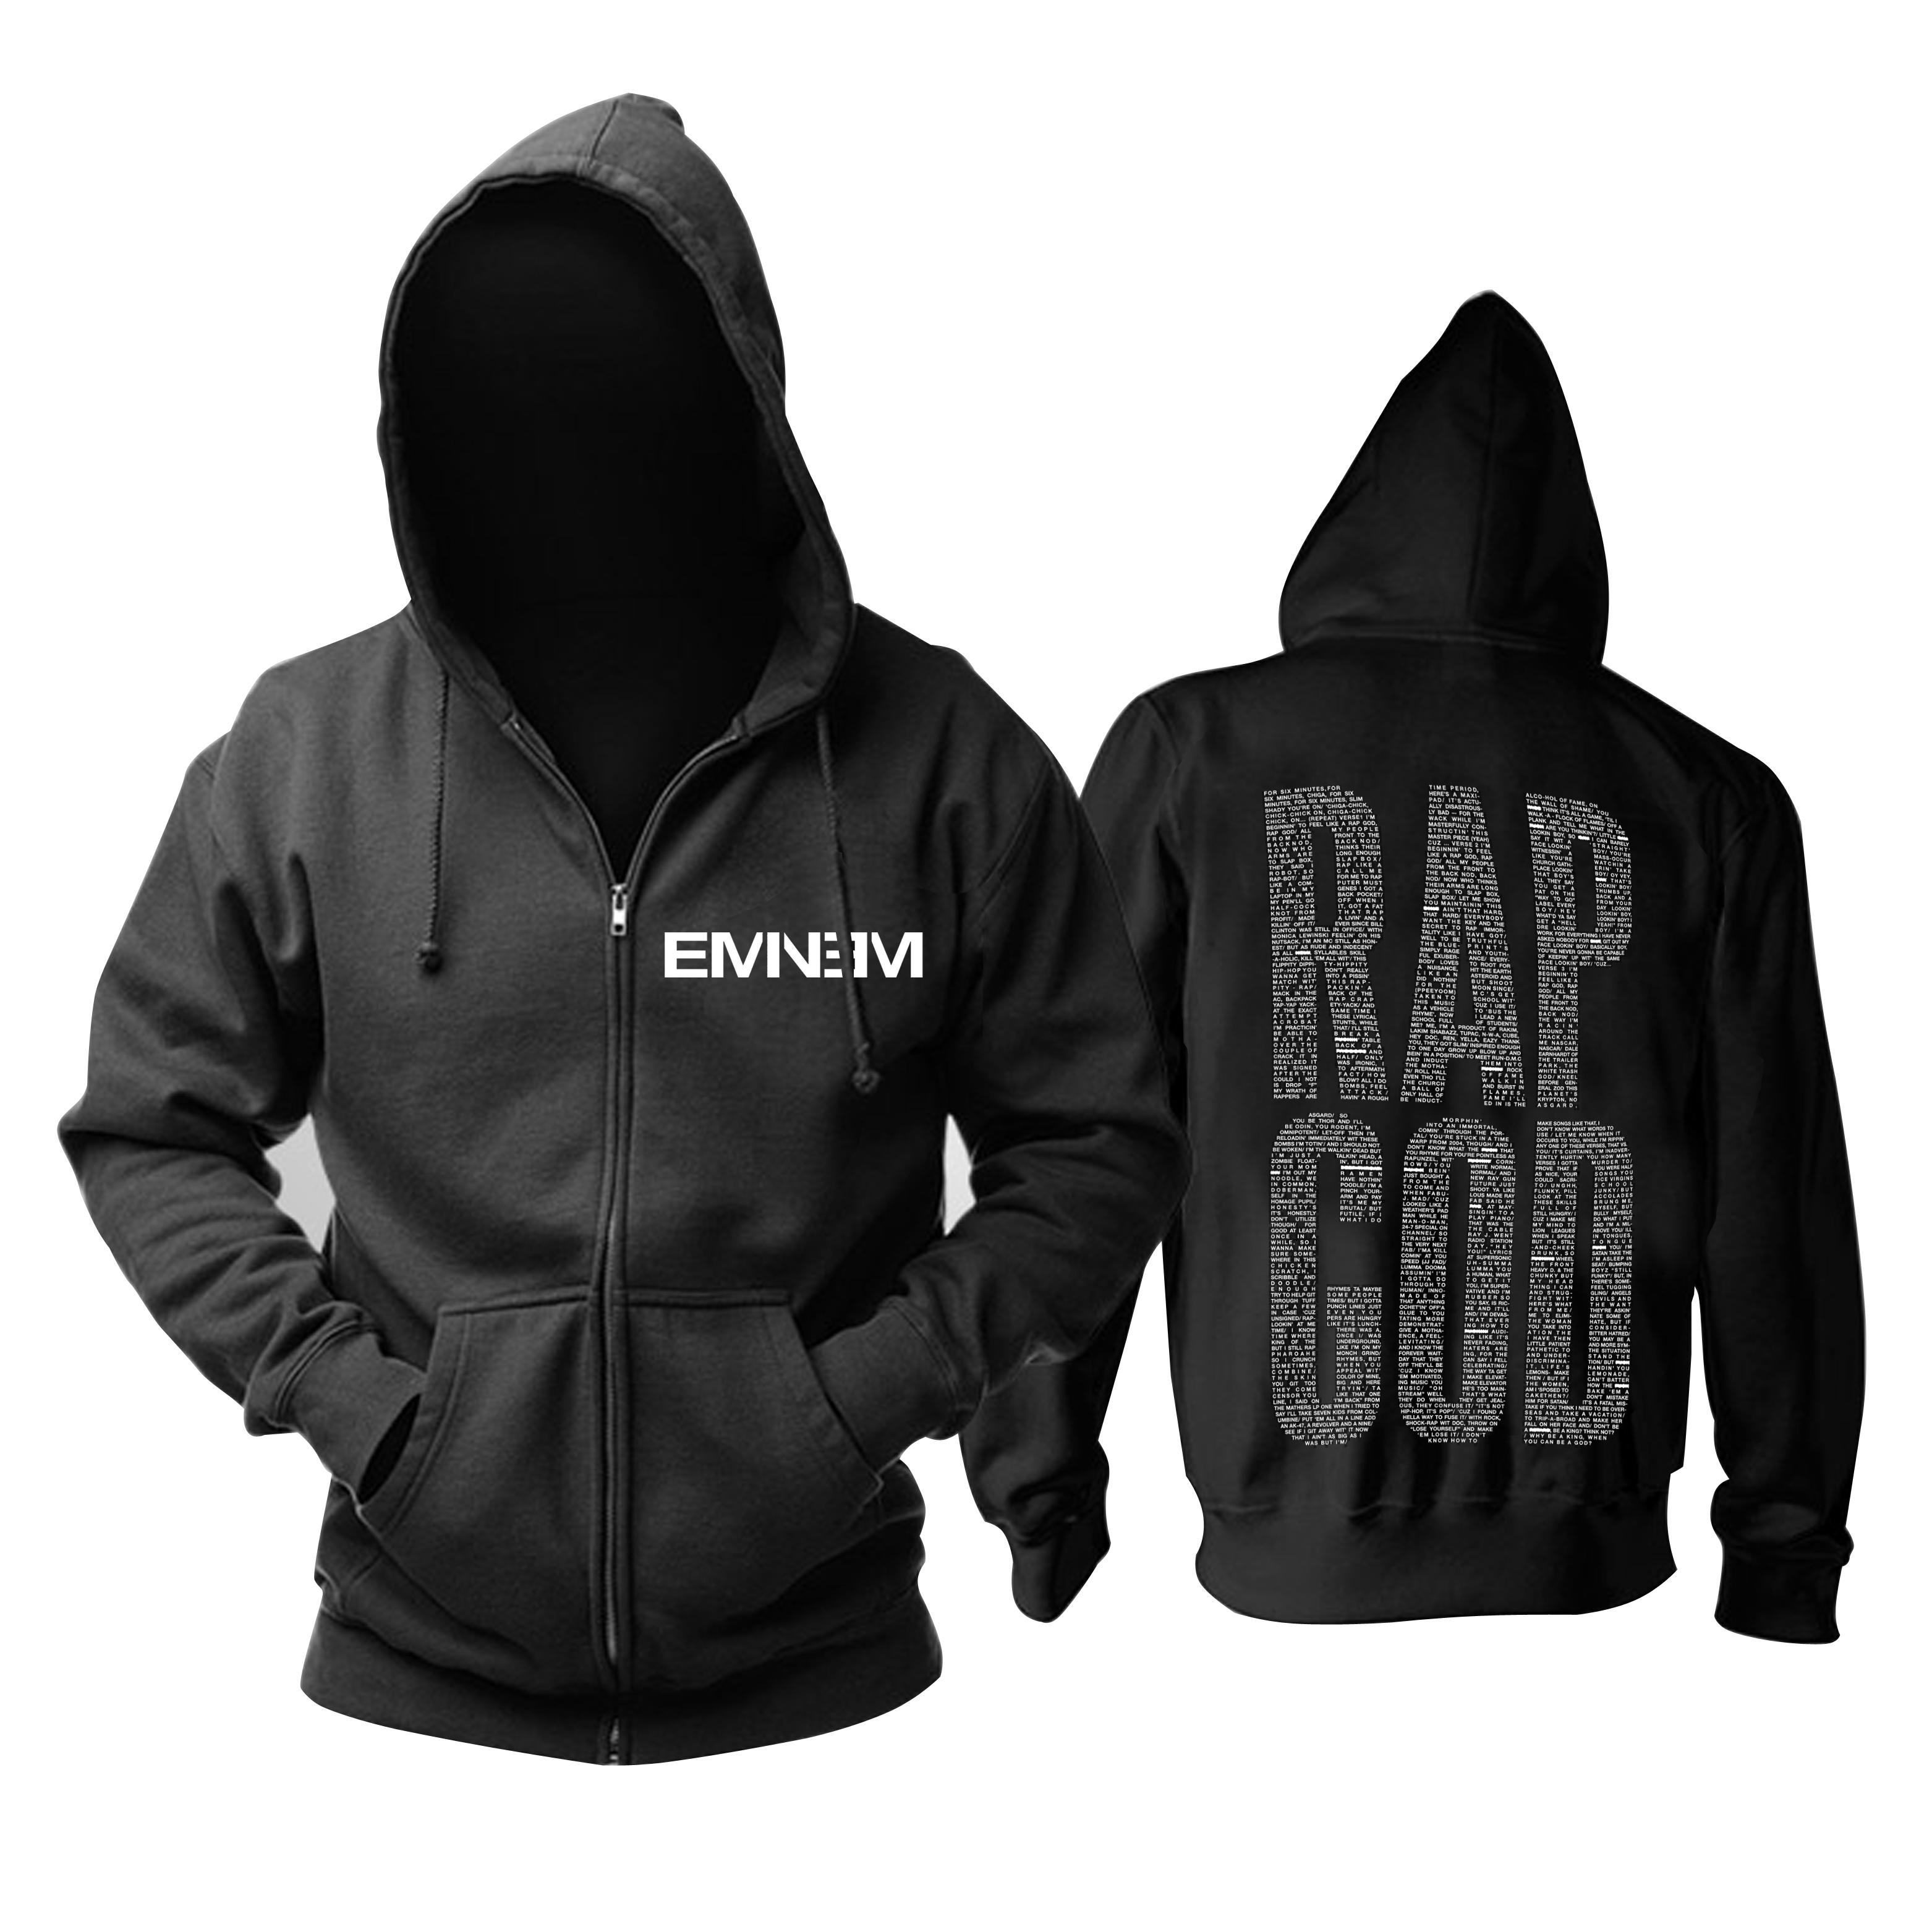 Collectibles Hoodie Eminem Rap God Black Pullover